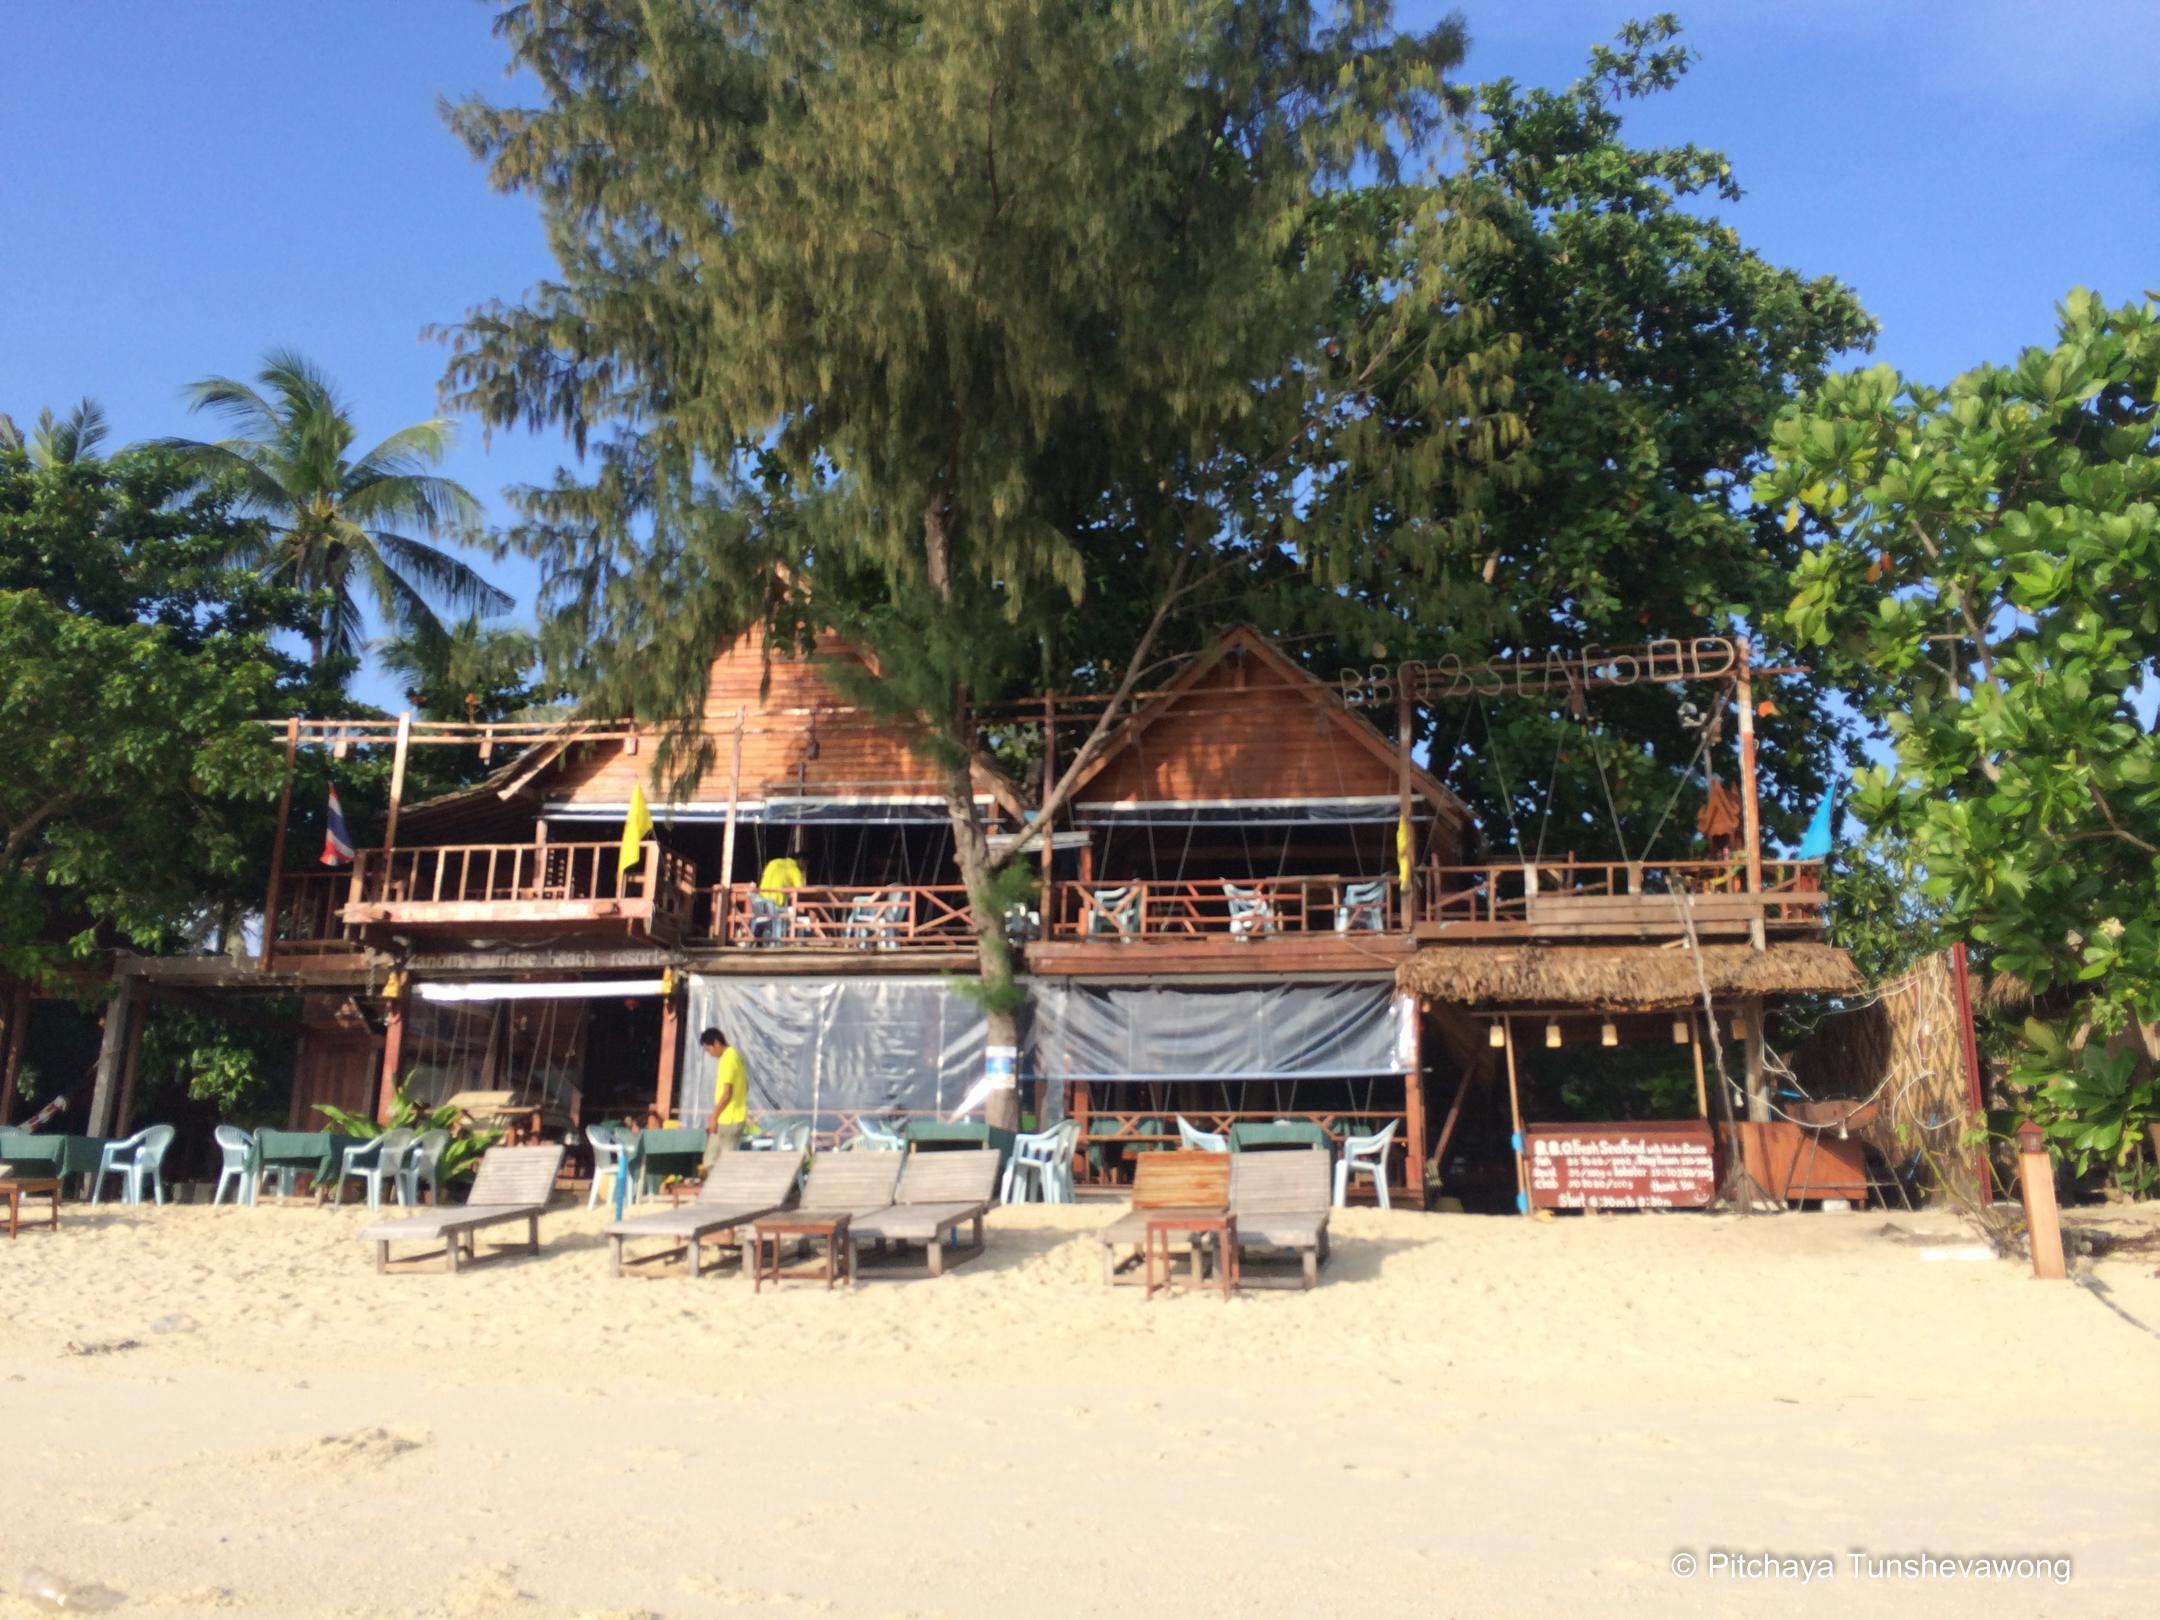 Zanom Sunrise Resort from the beach in the morning